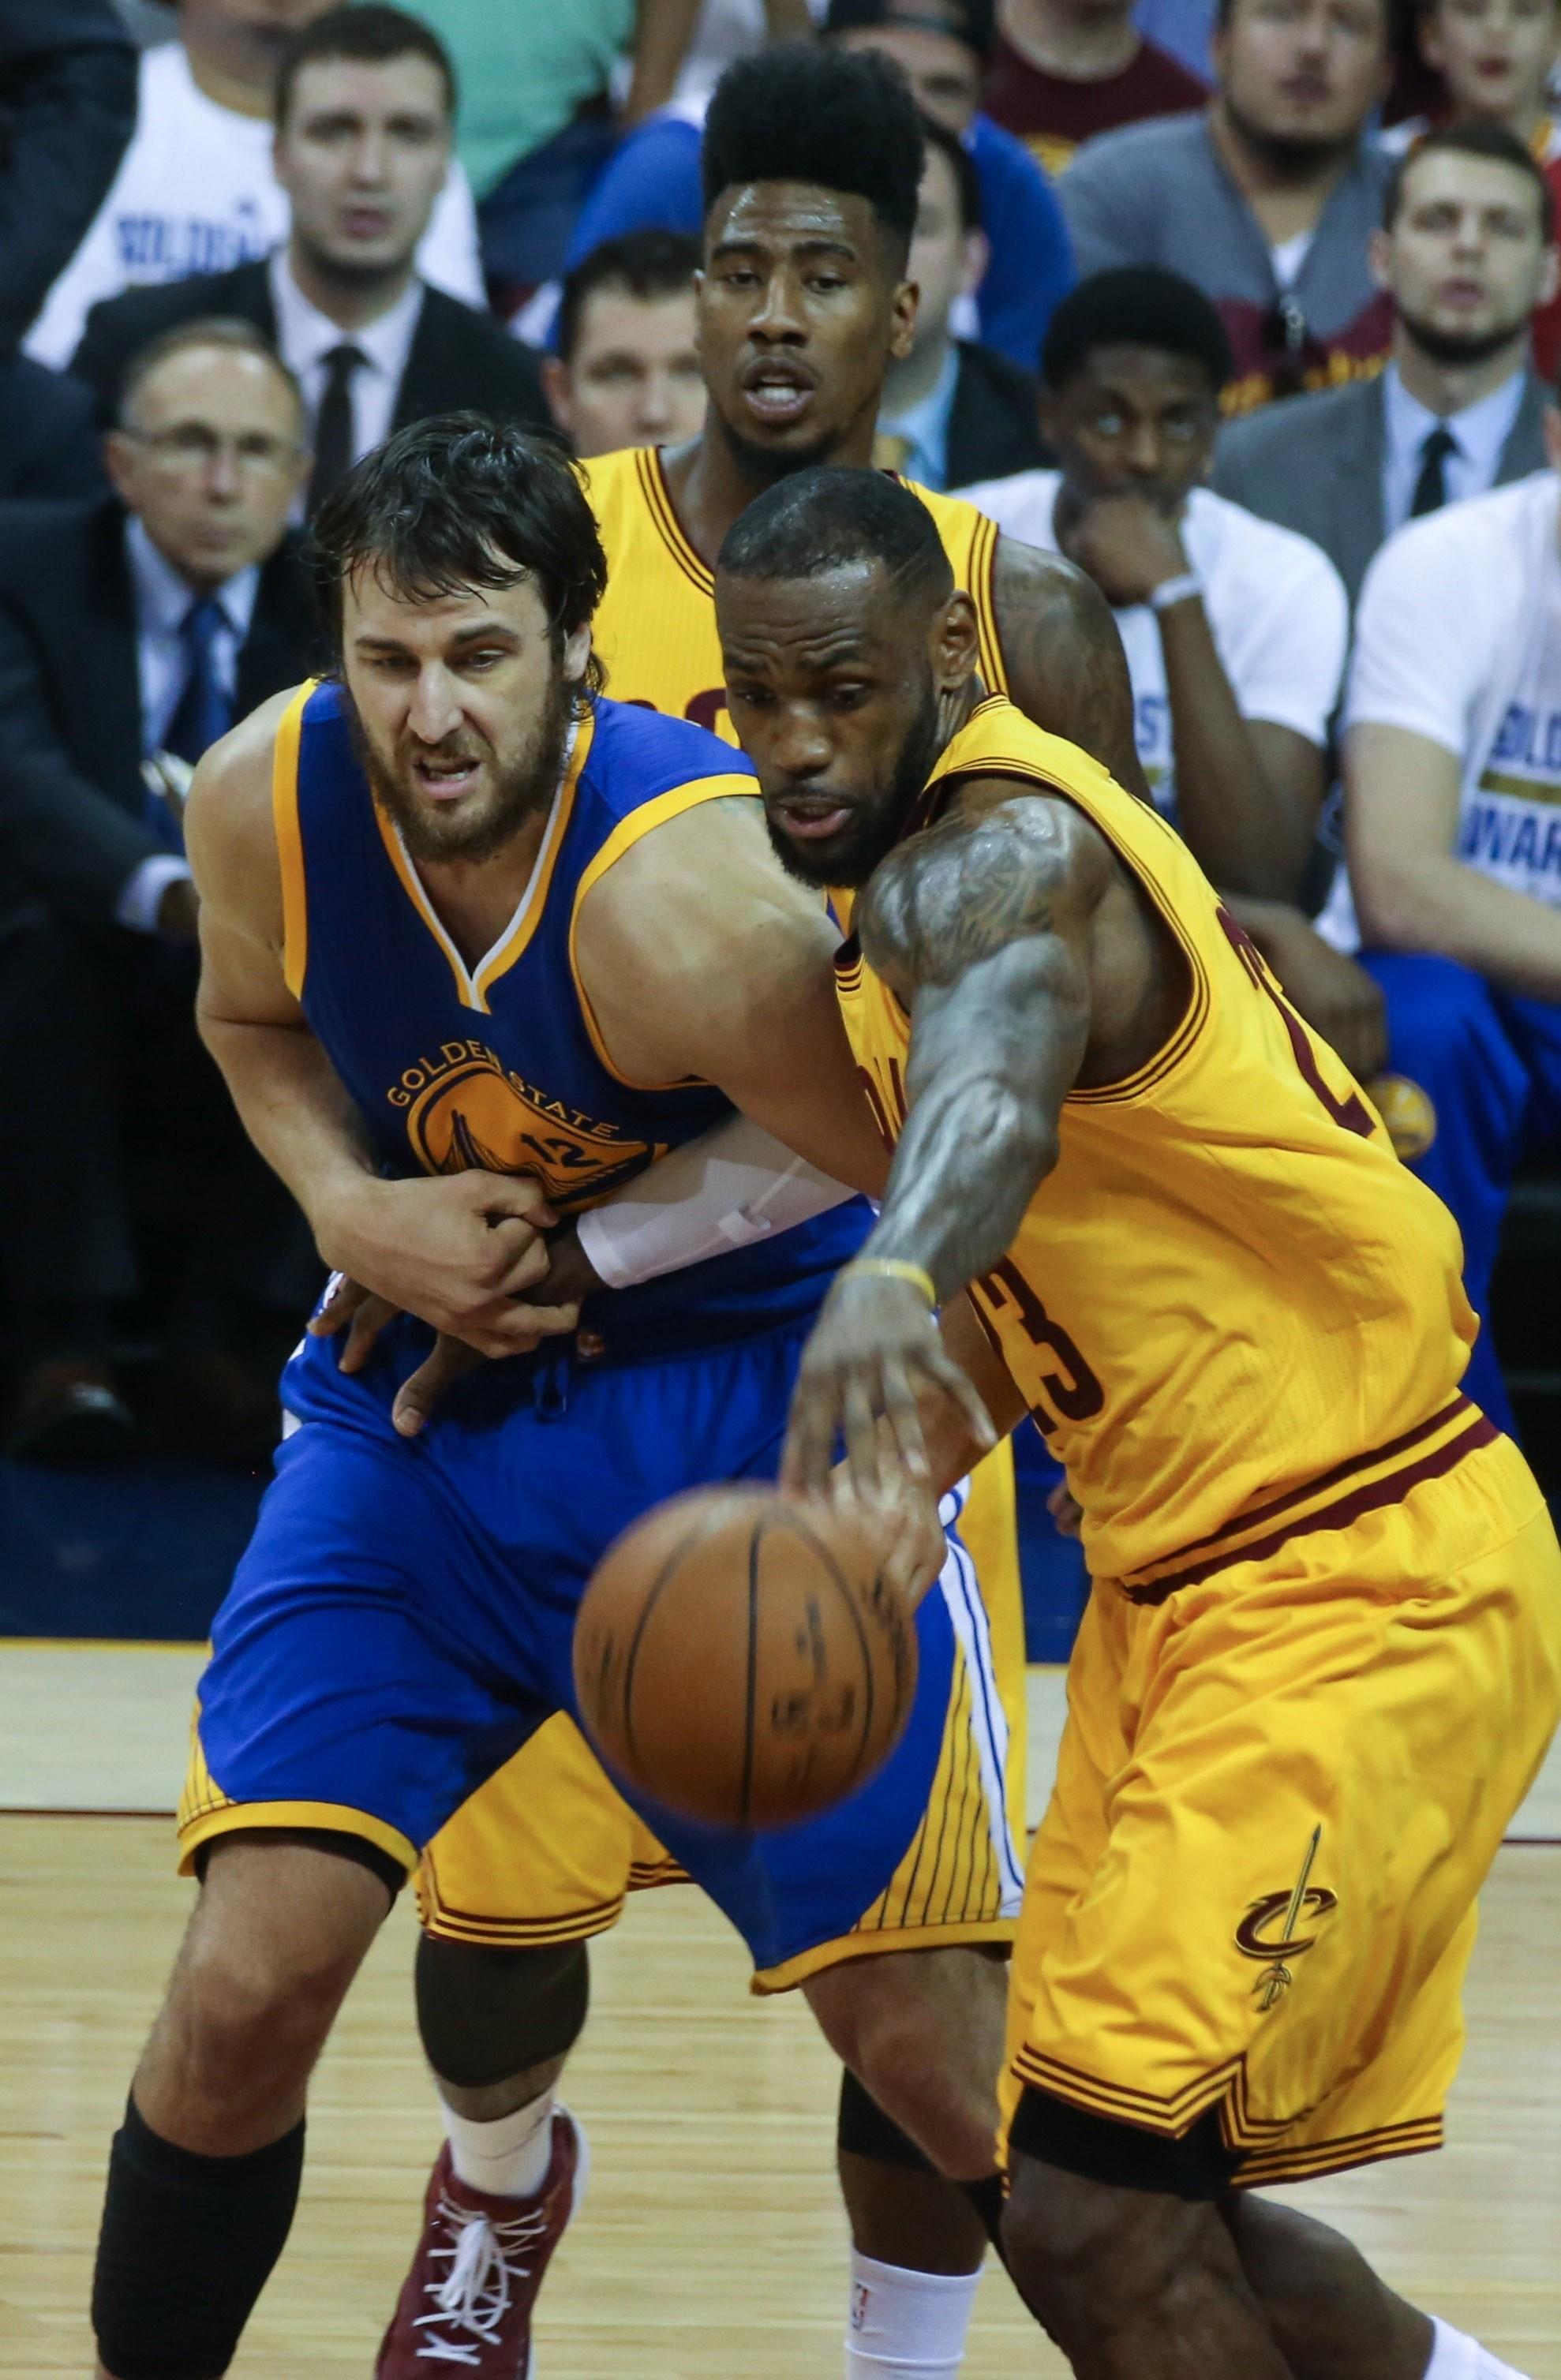 Cleveland Cavaliers Vs. Golden State Warriors - 2015 NBA Finals